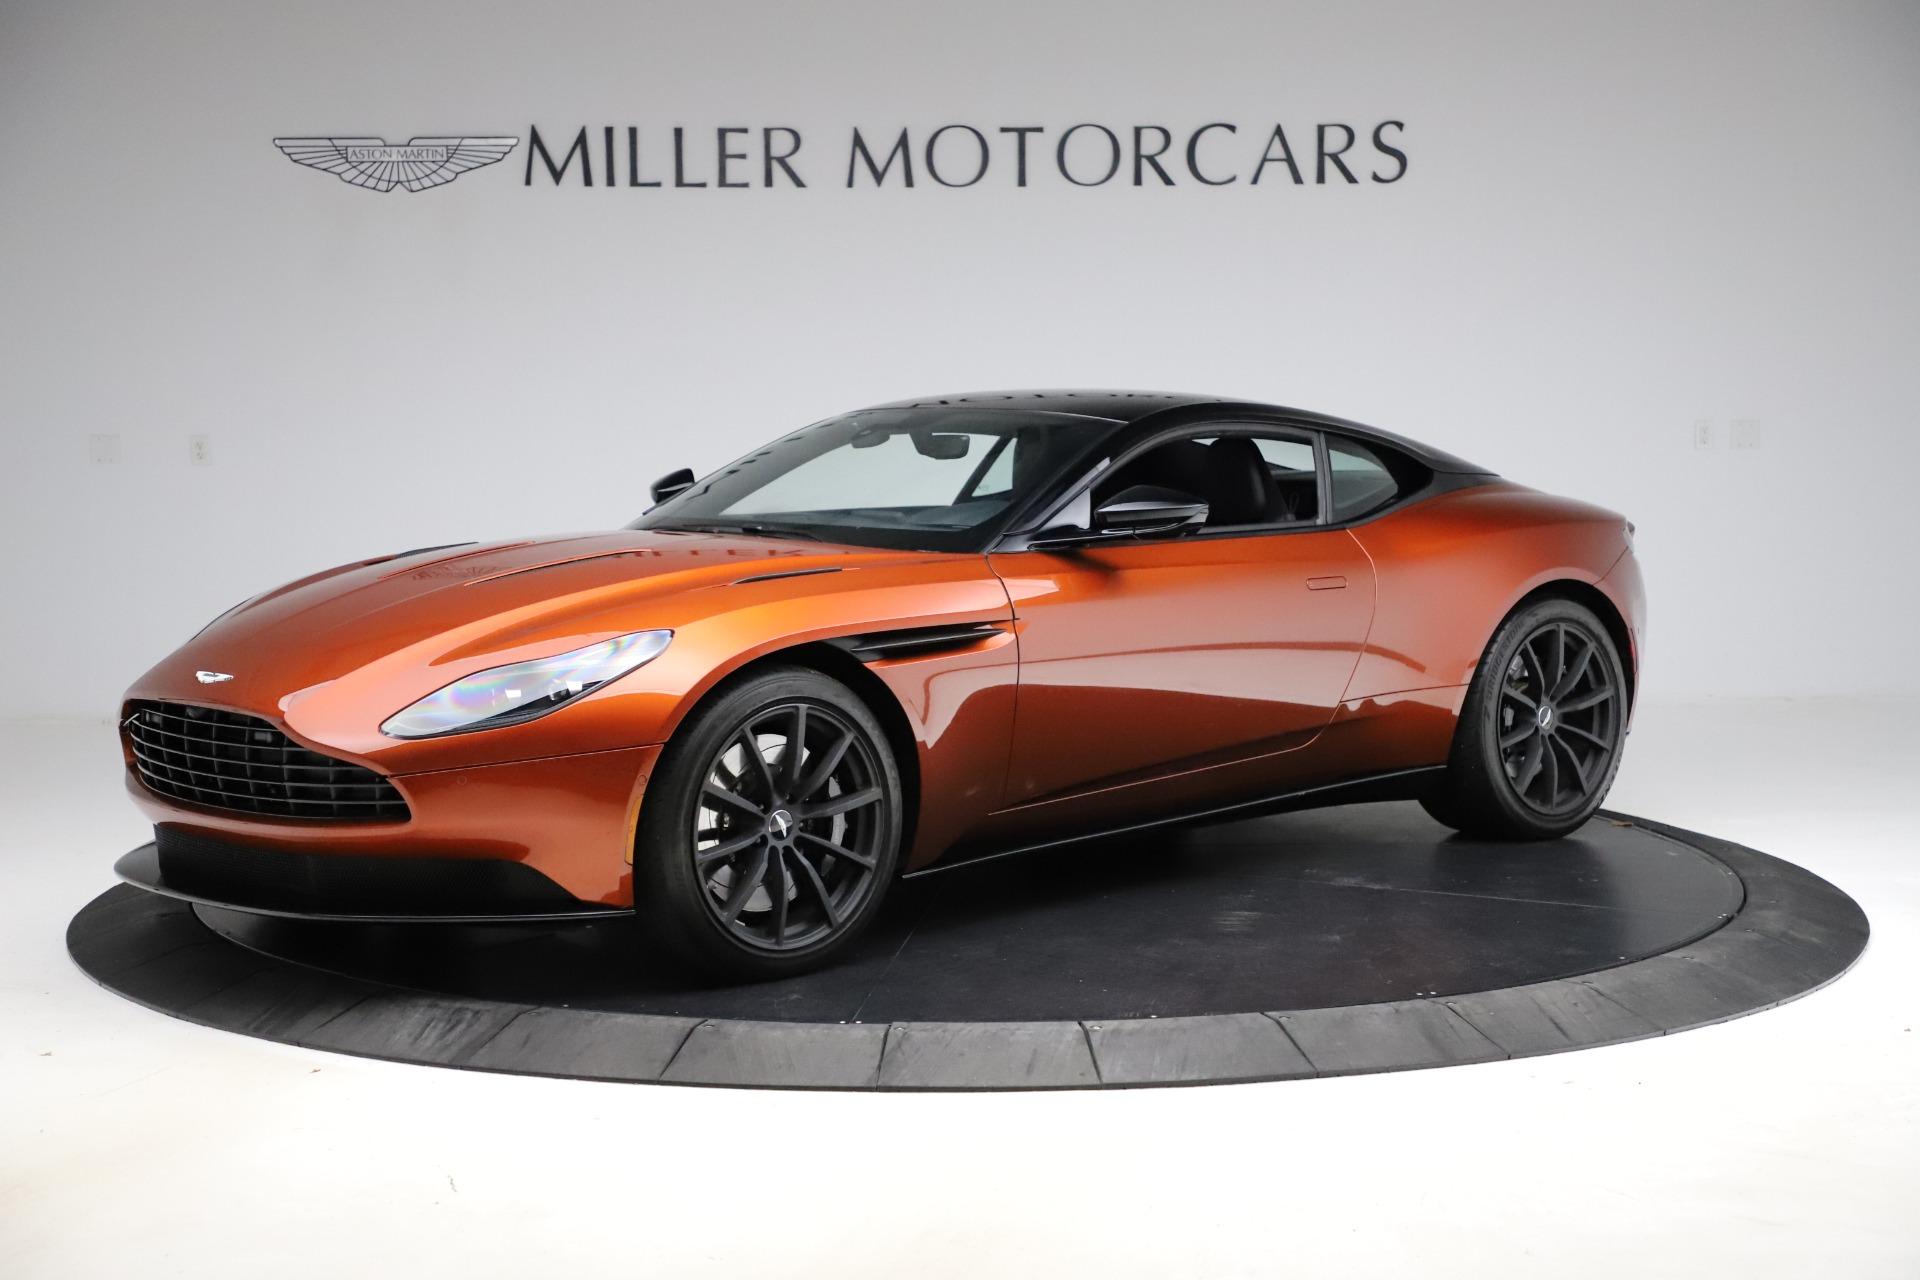 Used 2020 Aston Martin DB11 AMR for sale $199,900 at Alfa Romeo of Westport in Westport CT 06880 1